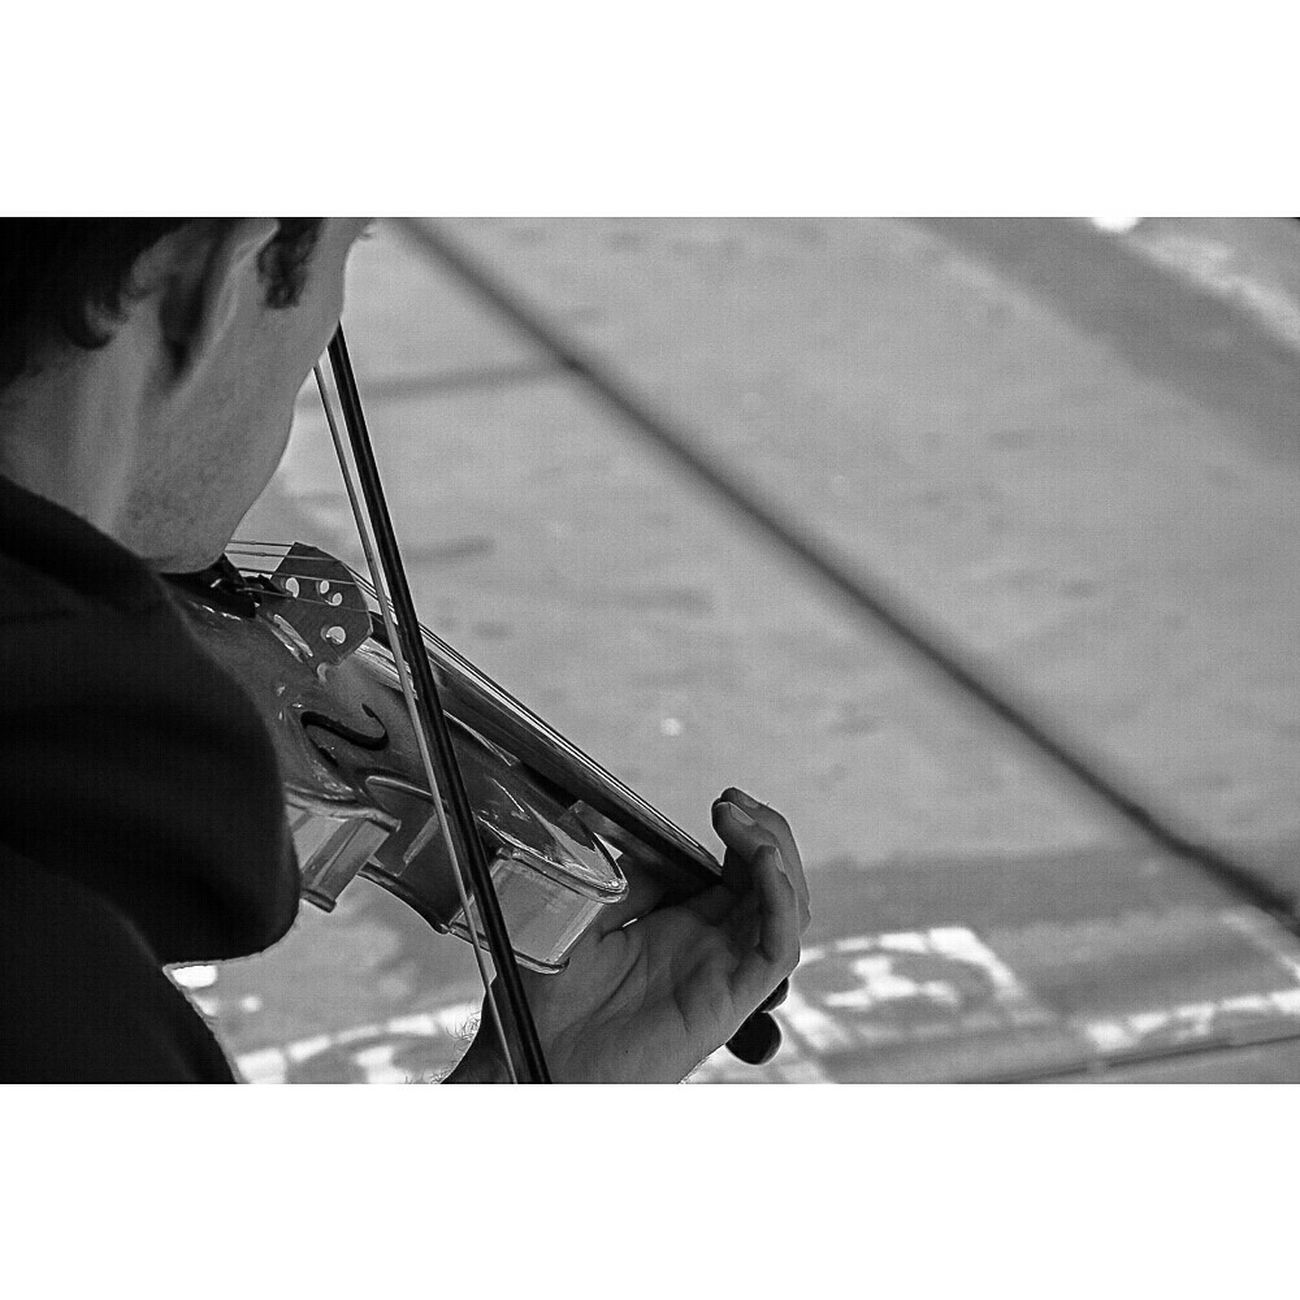 Streetphotographybw LoveBW Streetphotography_bw Photography Street Life Streetphoto Streetphotography